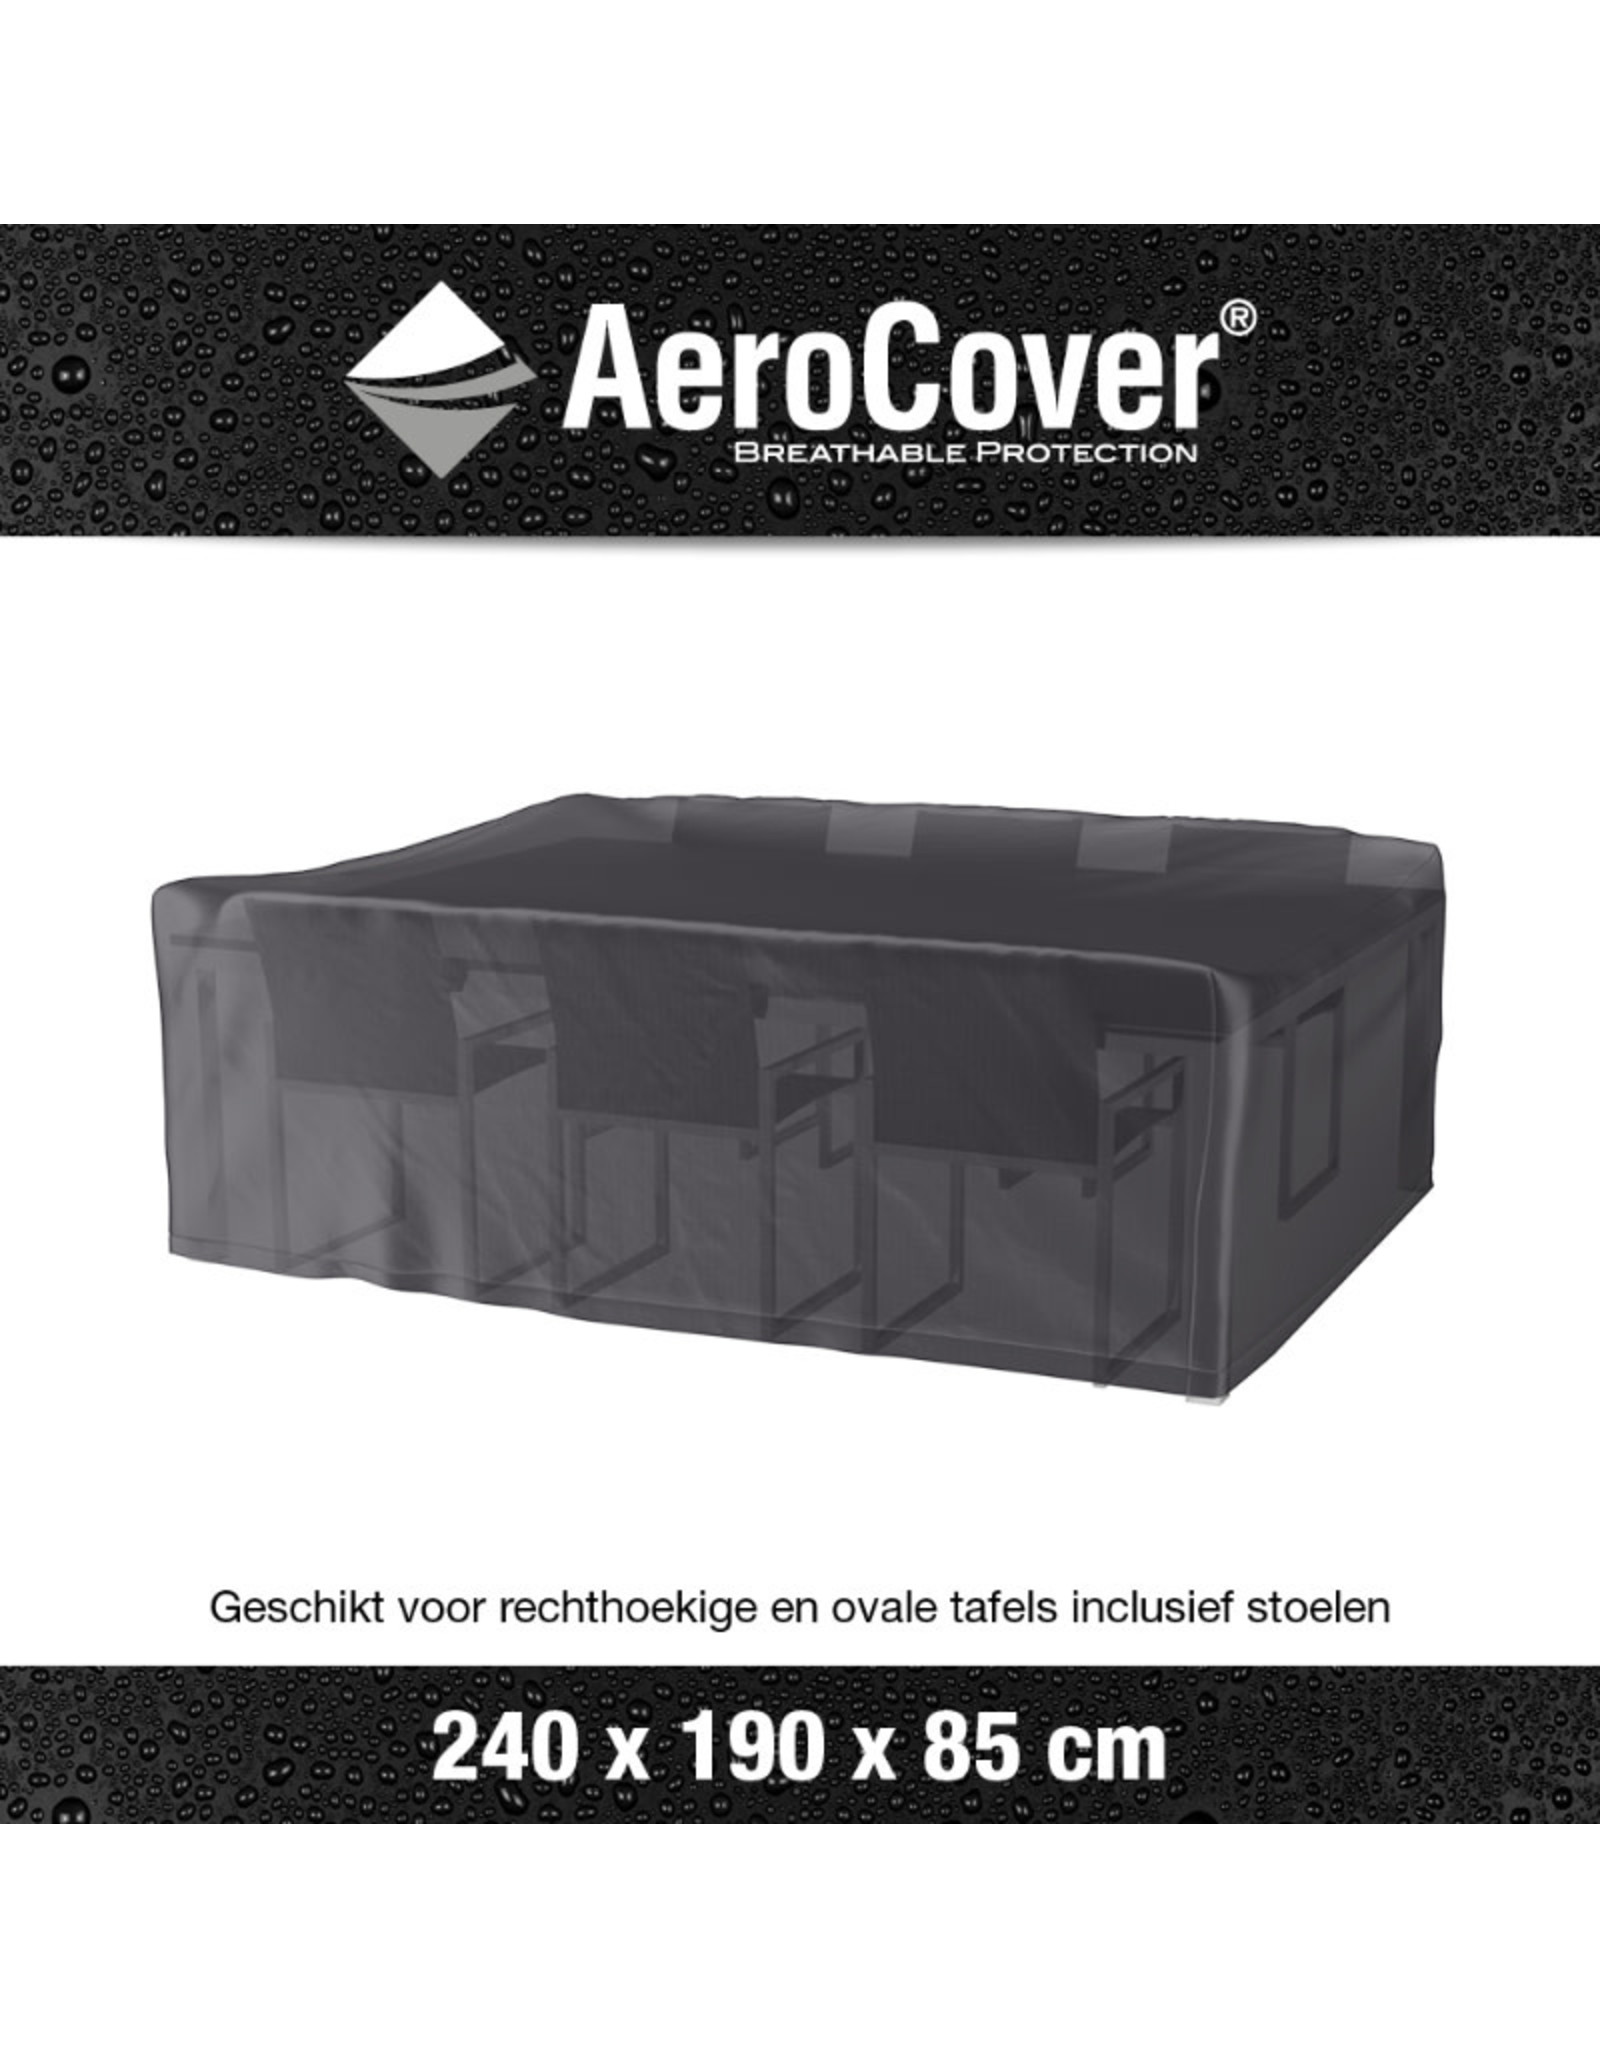 Aerocover AeroCover Tuinsethoes 240x190xH85